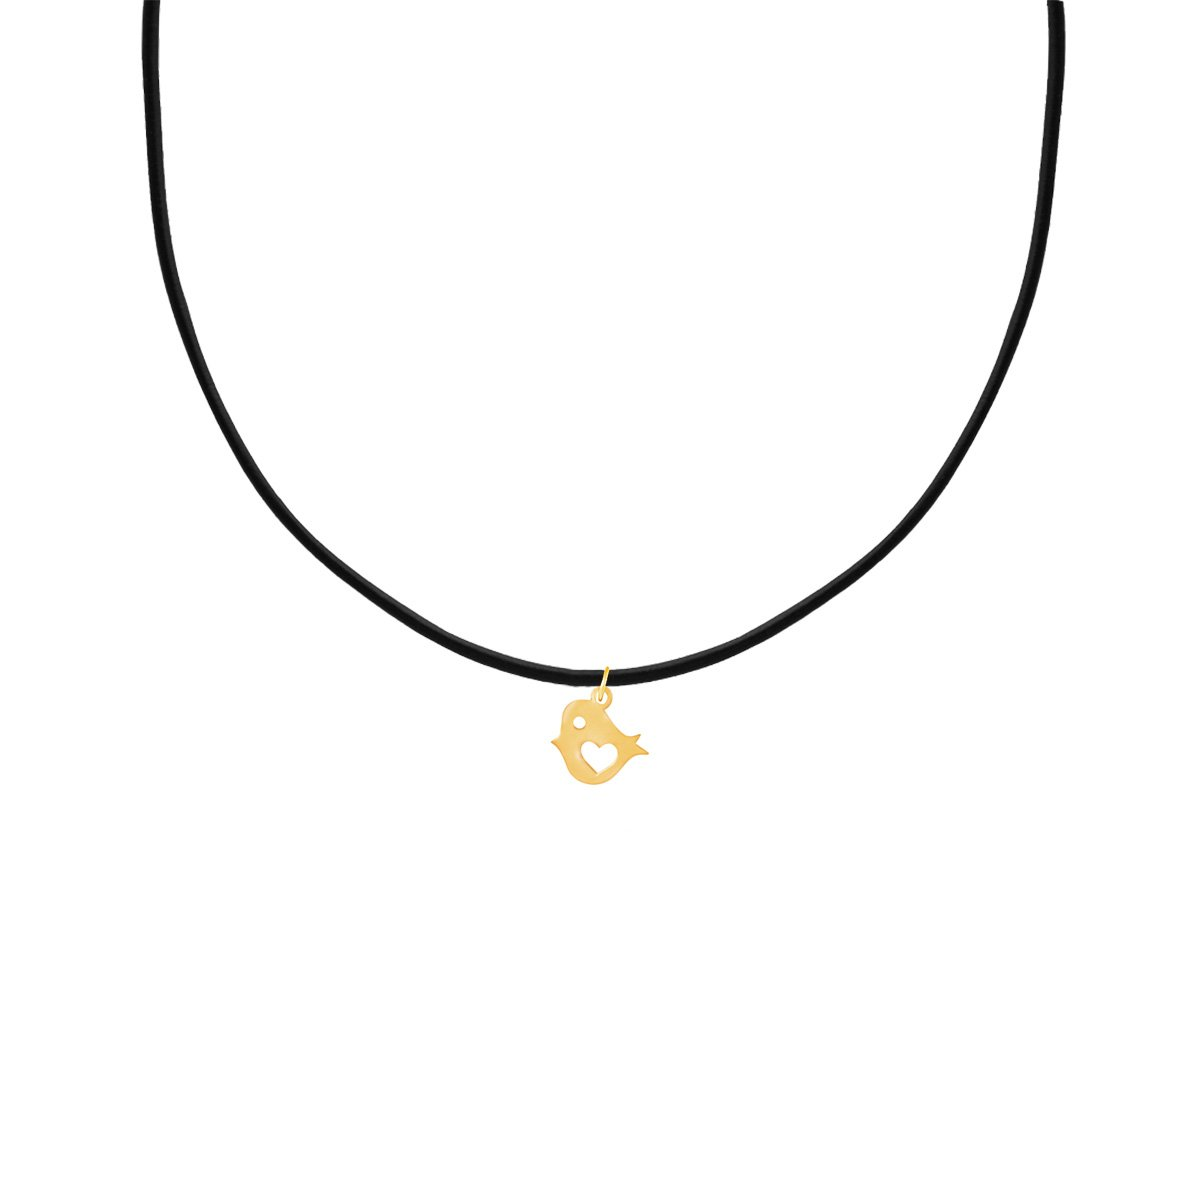 پرسته گردنبند طلا گنجشک و قلب